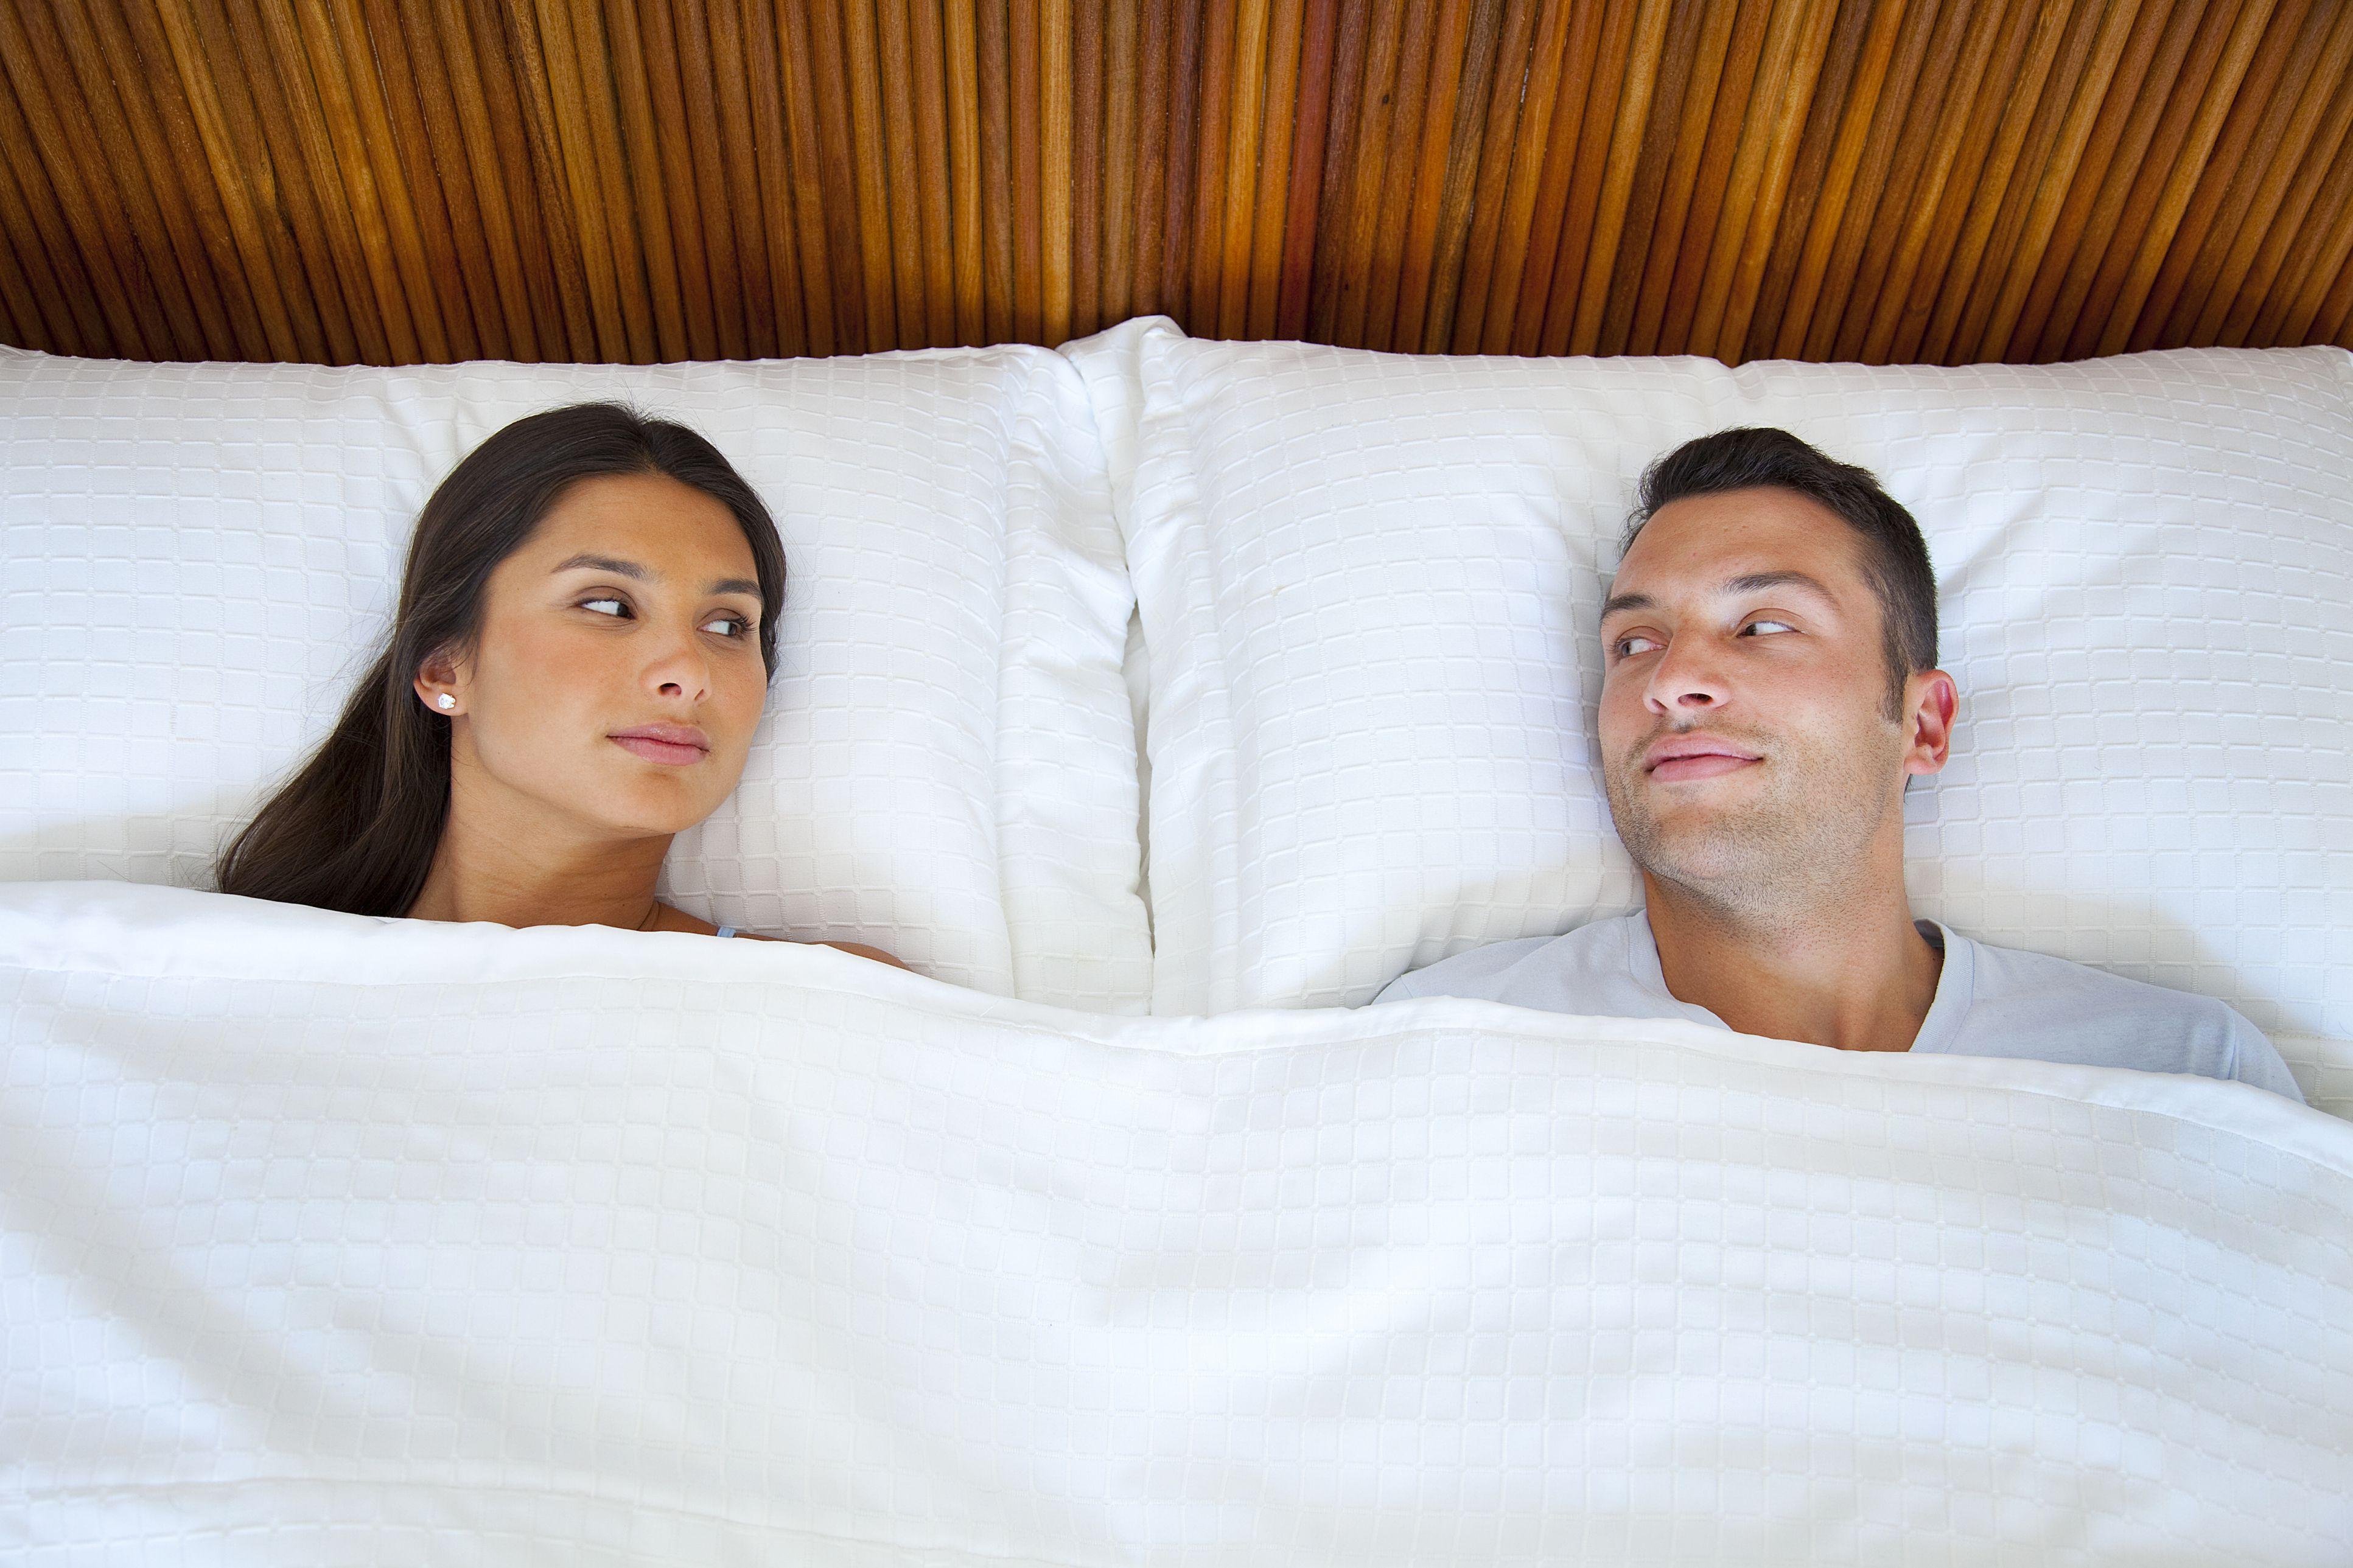 Men taking clomid for fertility